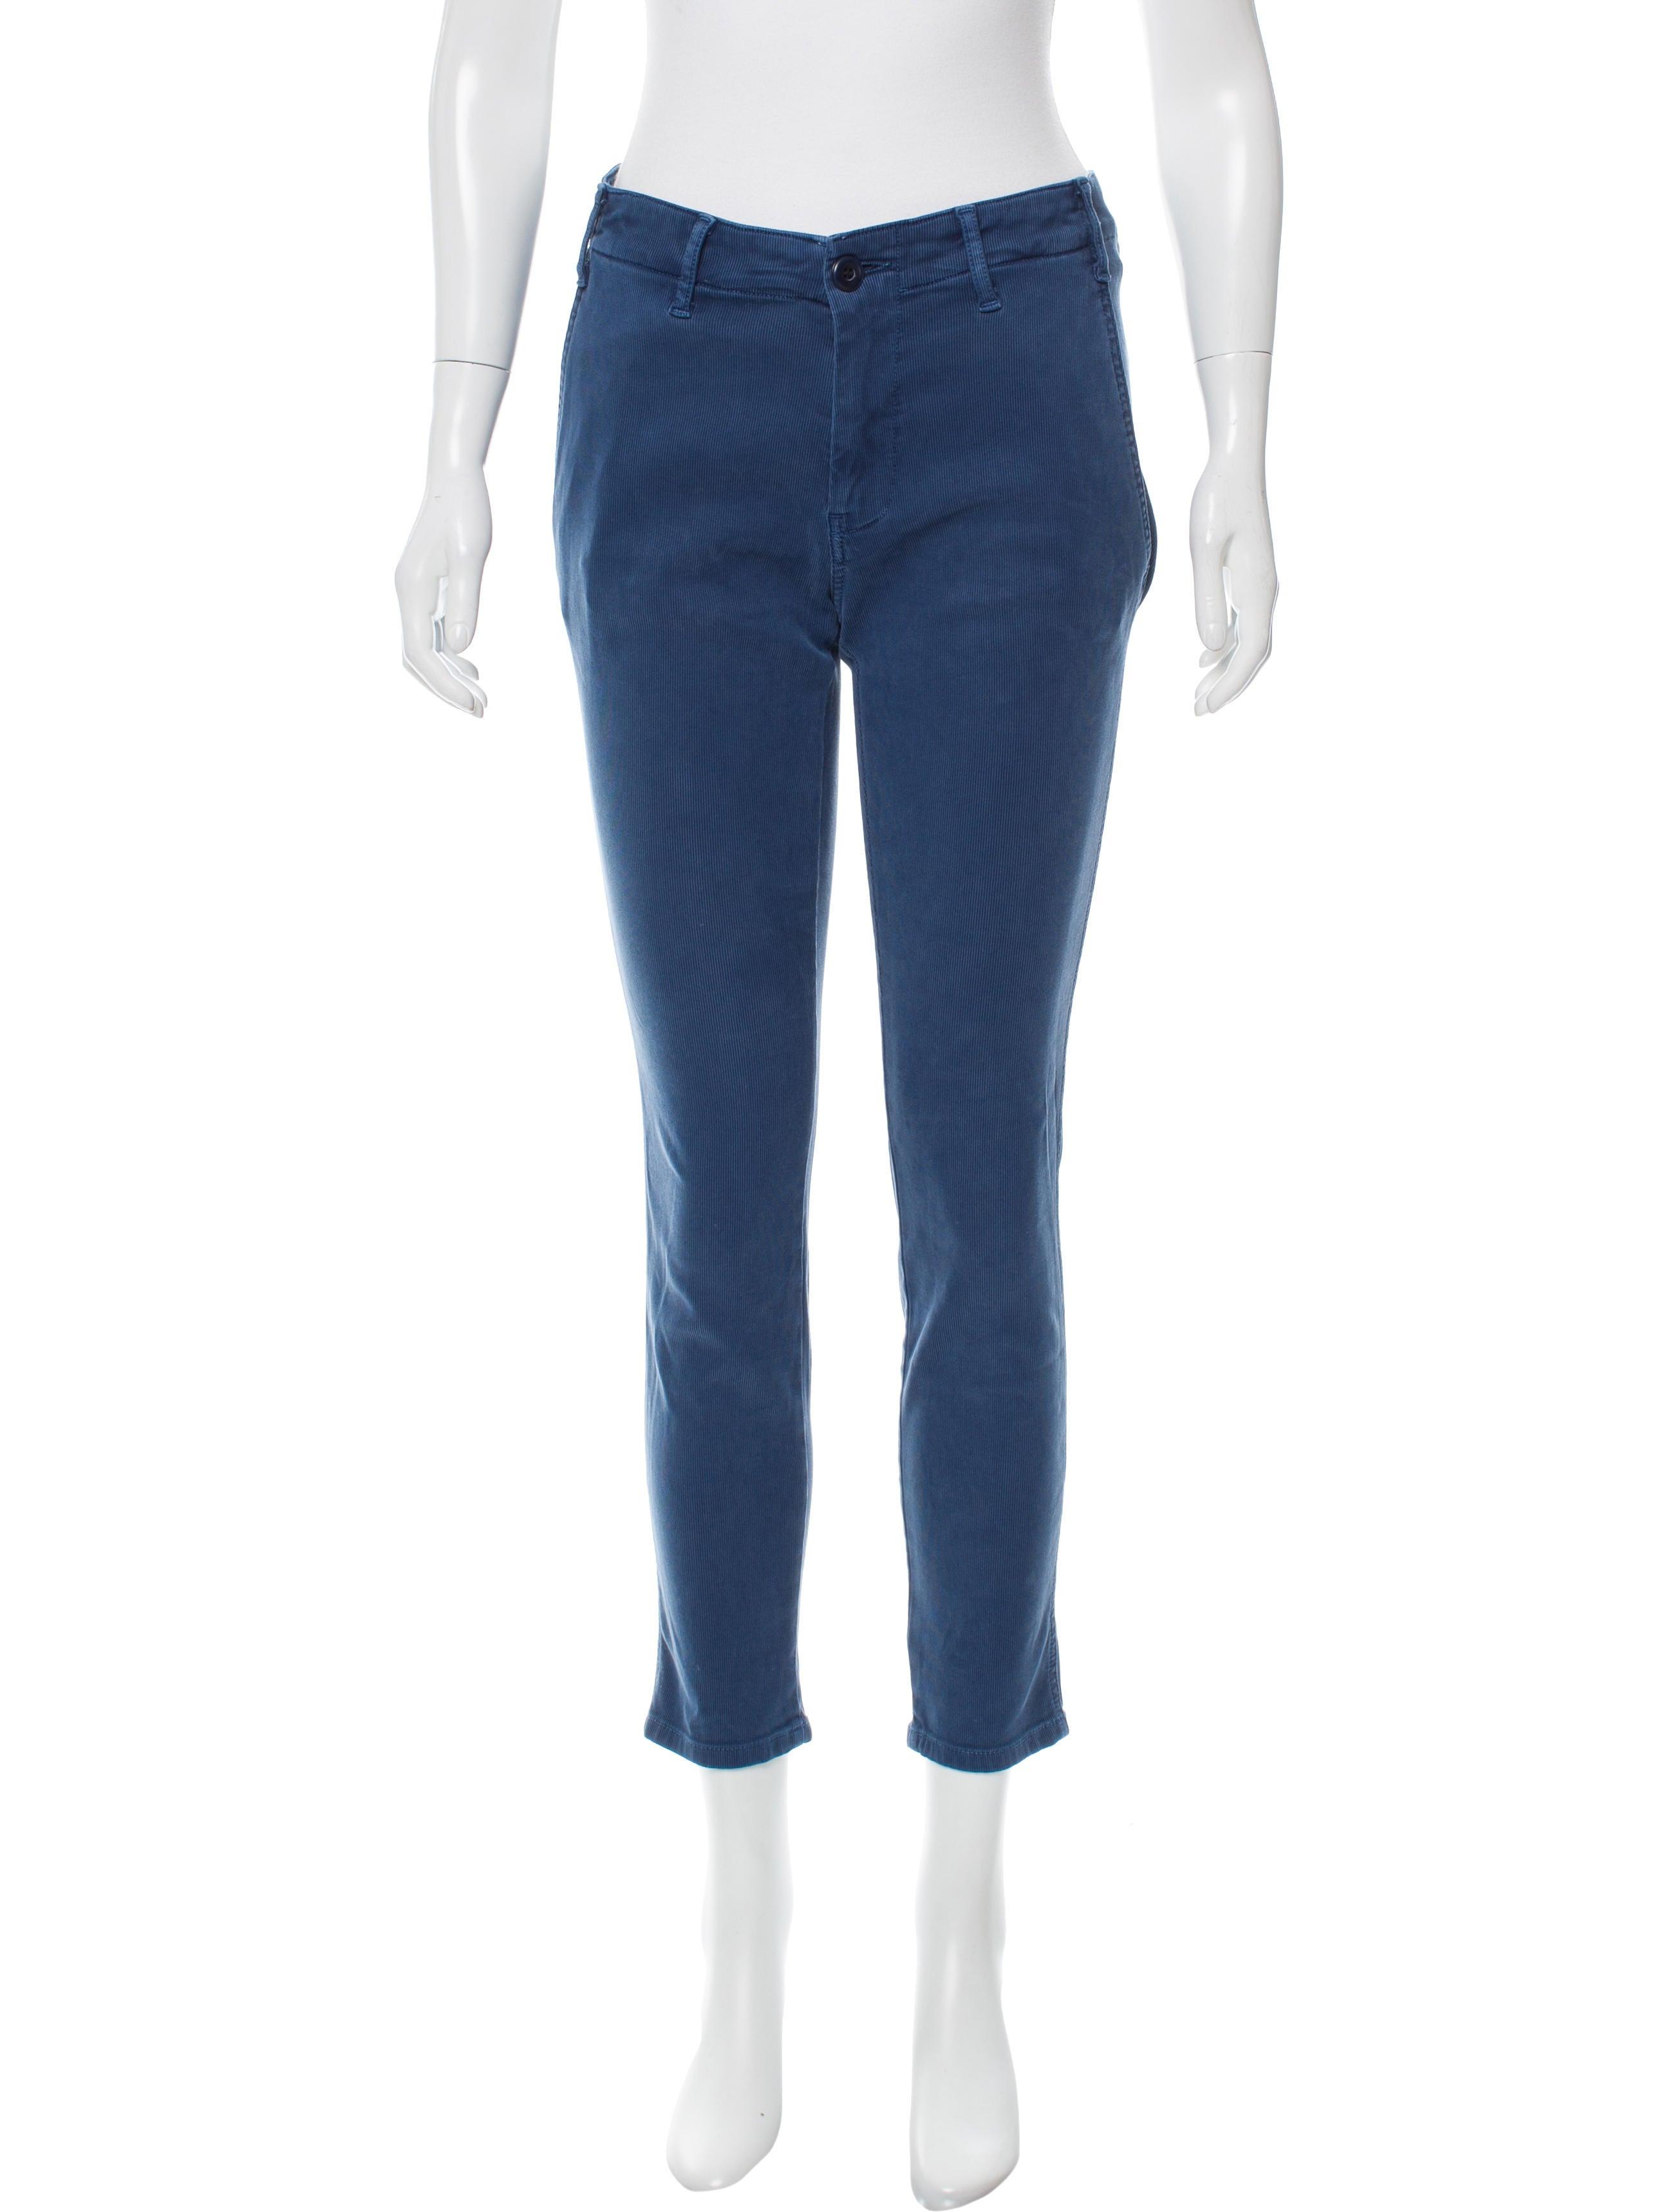 Free shipping and returns on Women's Corduroy Skinny Pants at londonmetalumni.ml